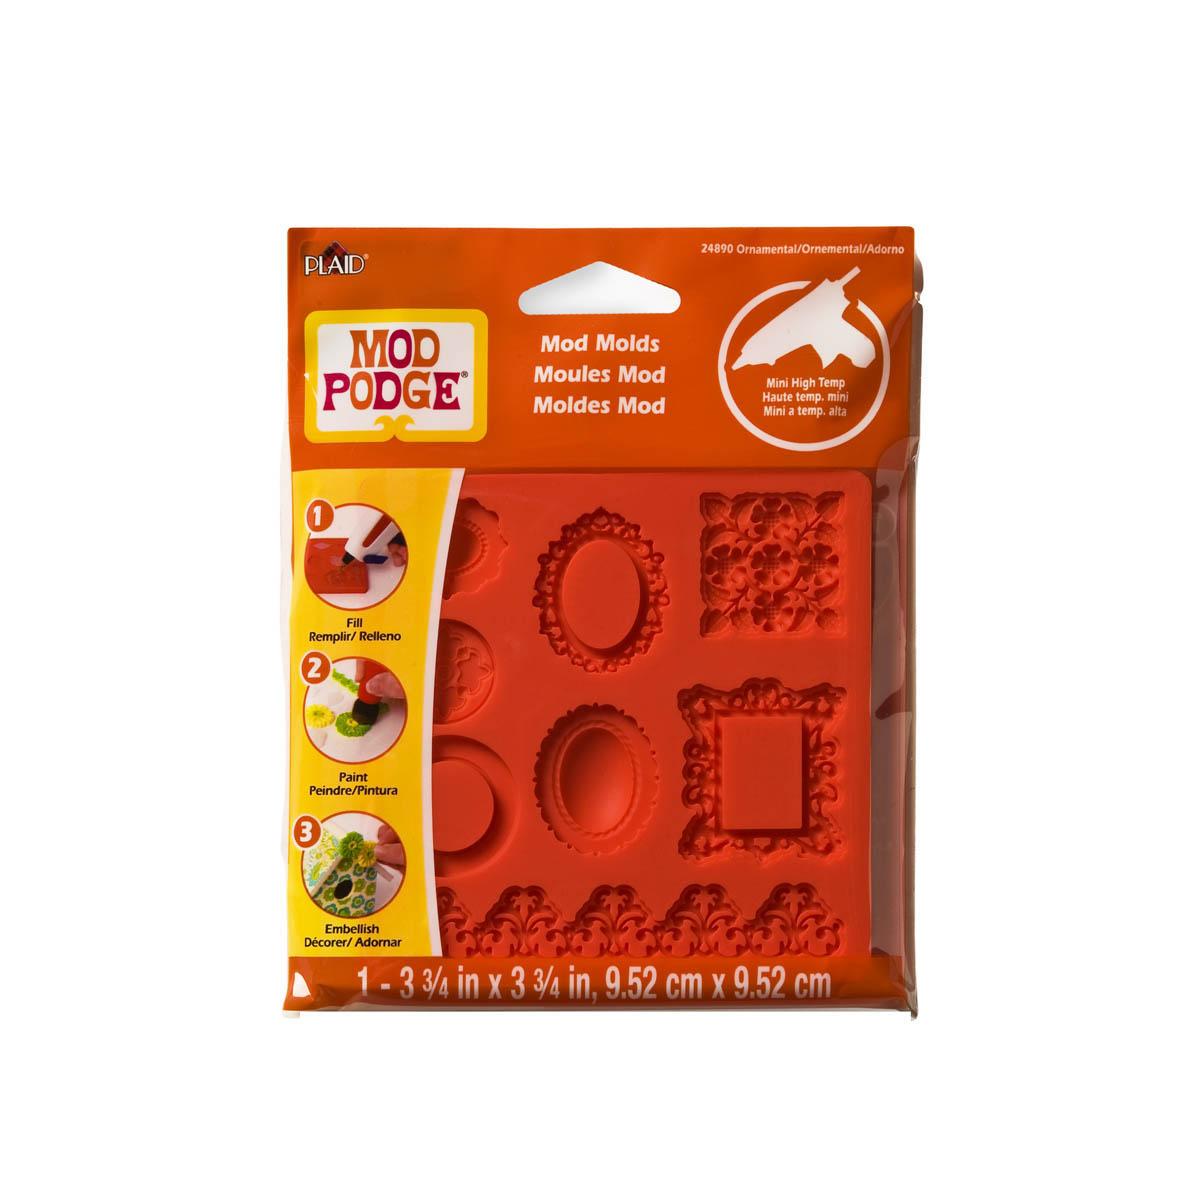 Mod Podge ® Mod Molds - Ornaments